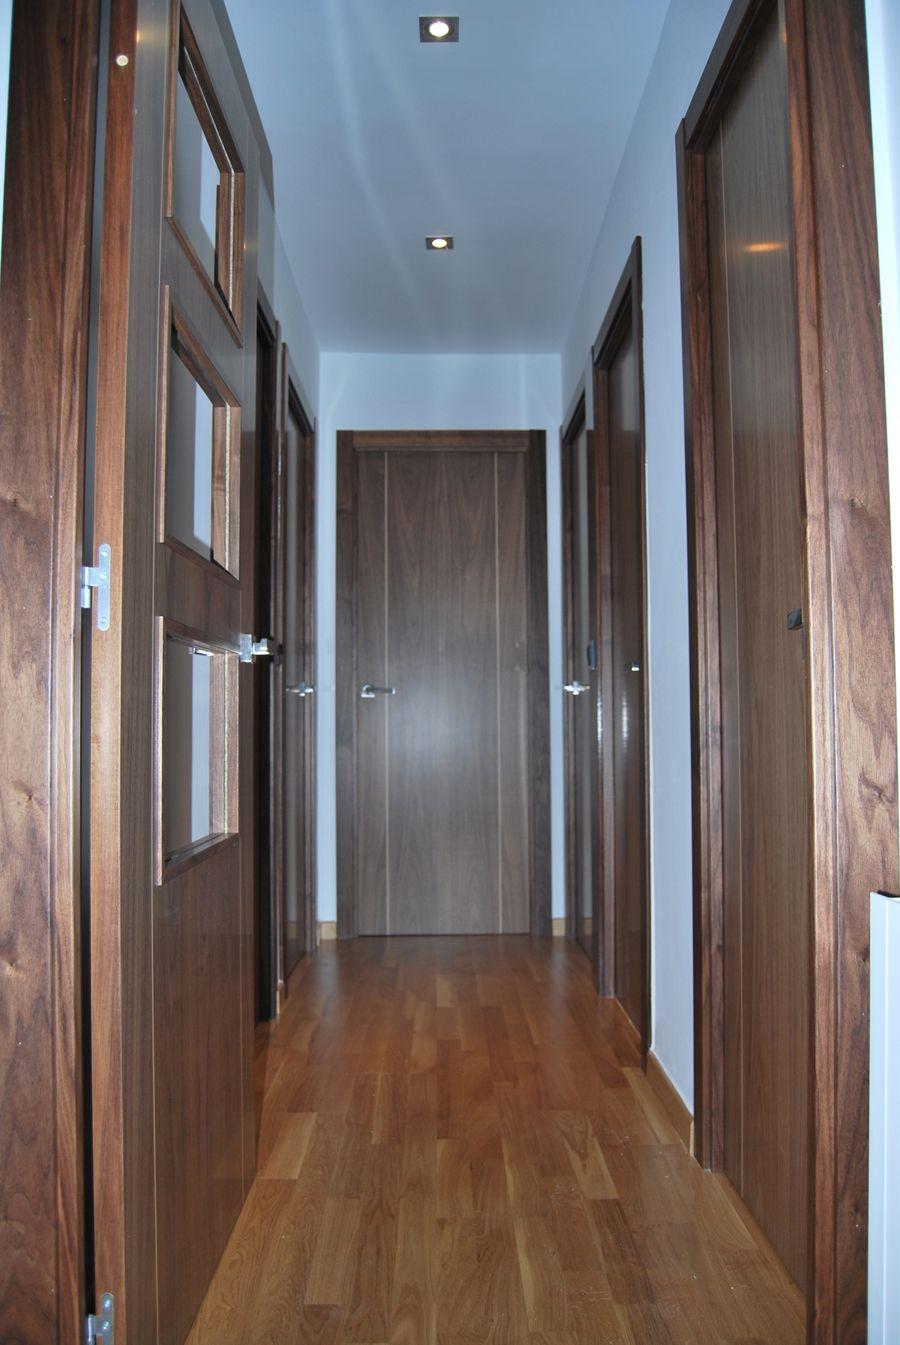 Decoracion contemporaneo pasillo madera puertas for Adornos puertas madera